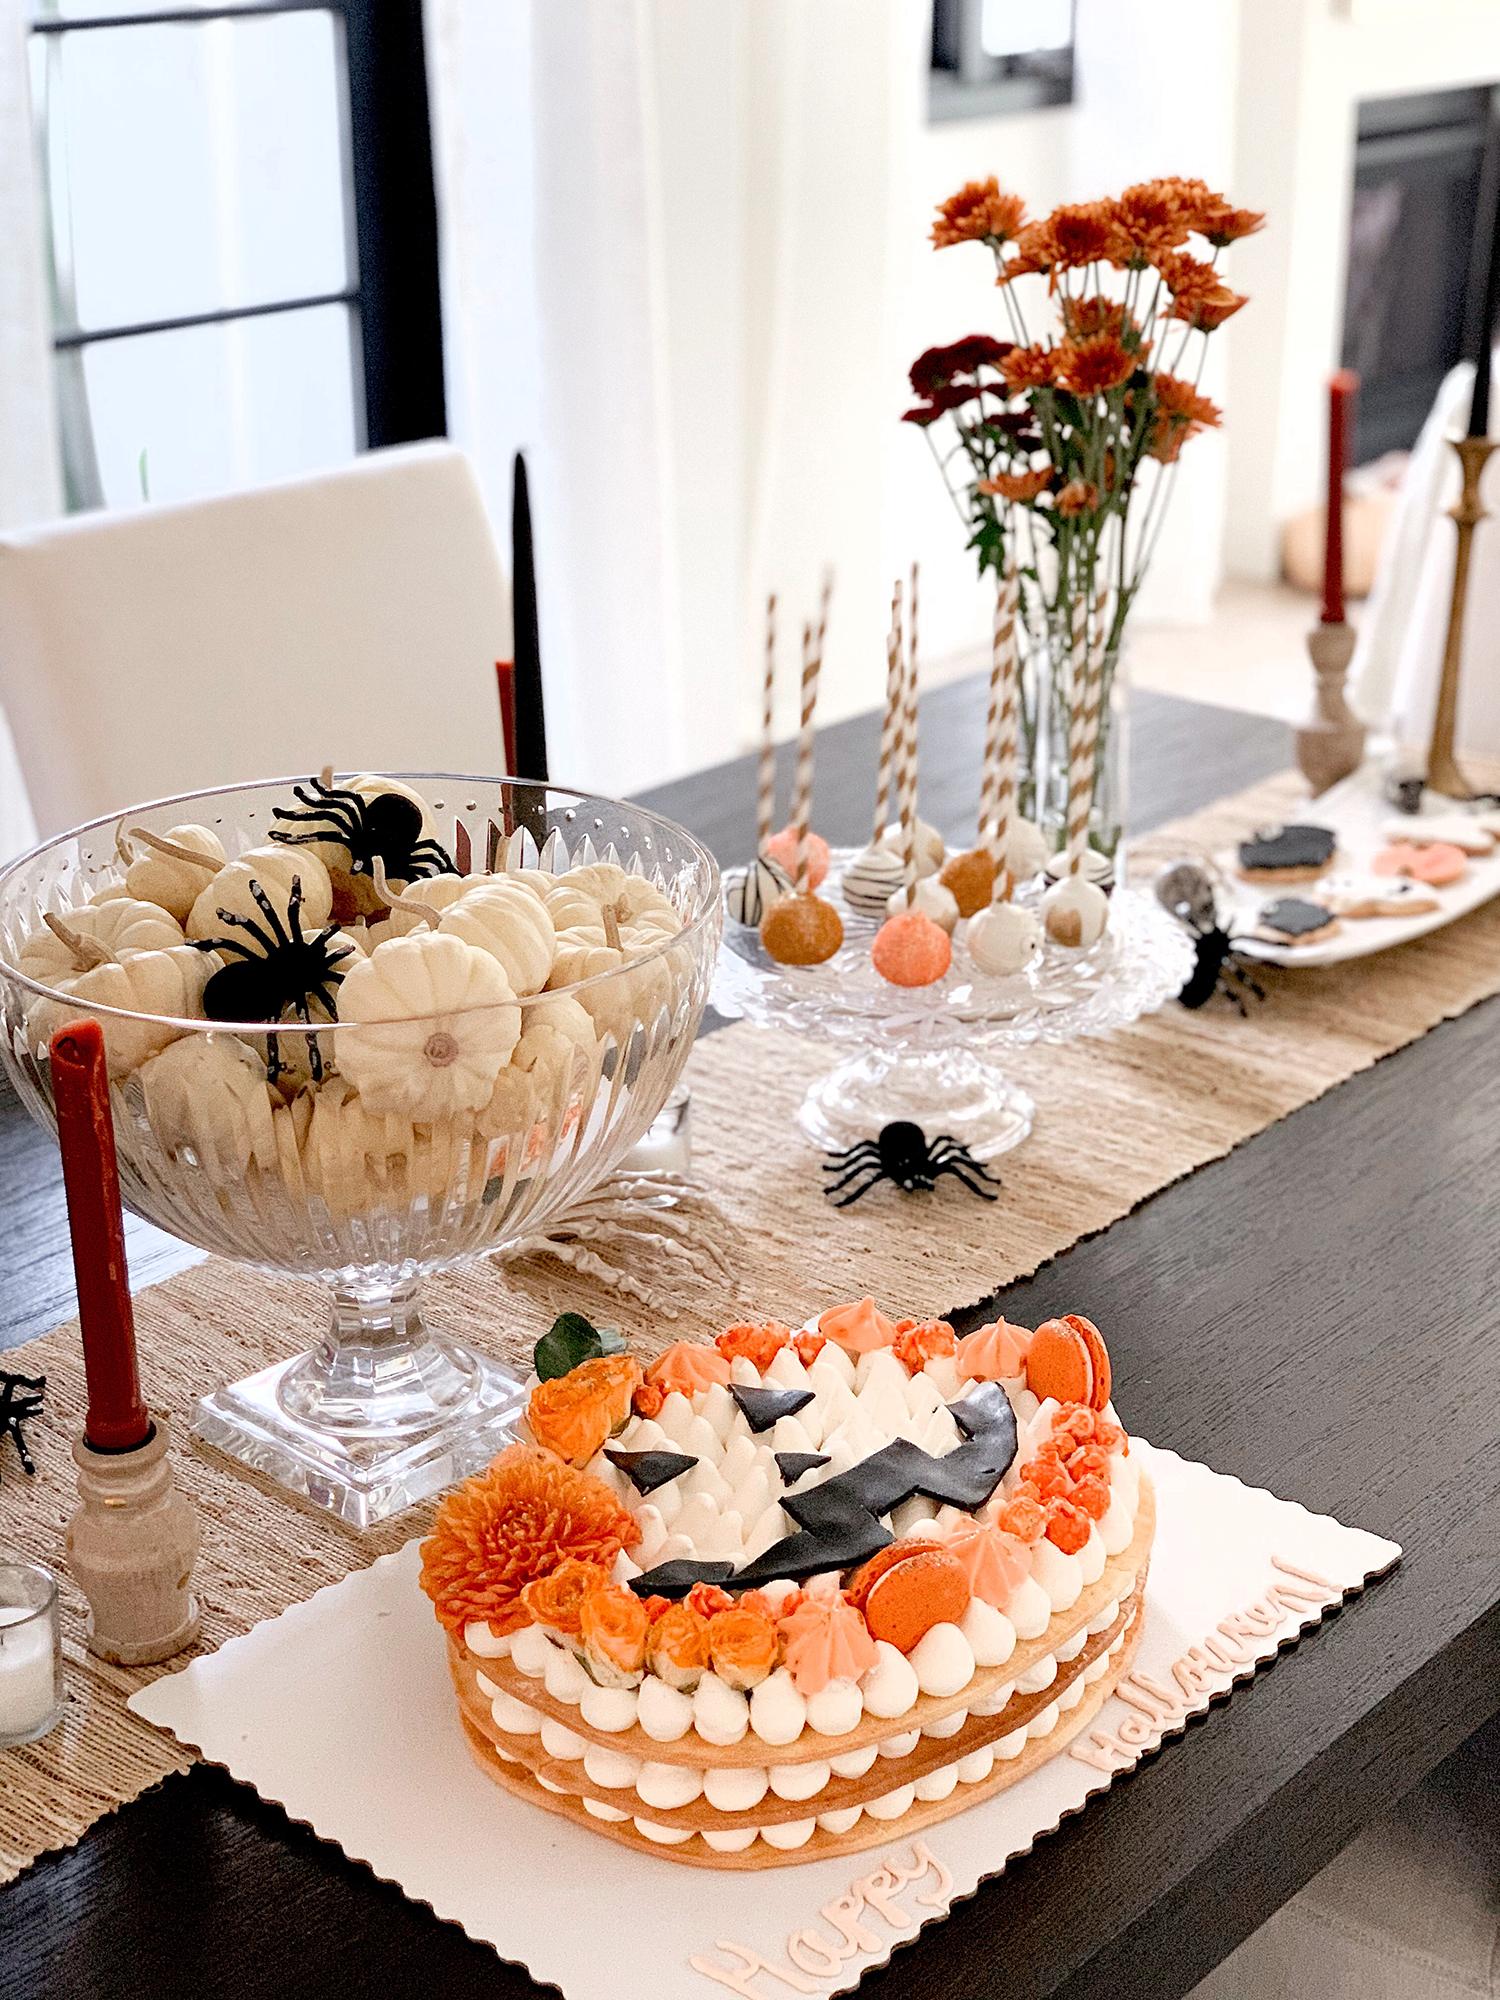 crumbles patisserie desserts